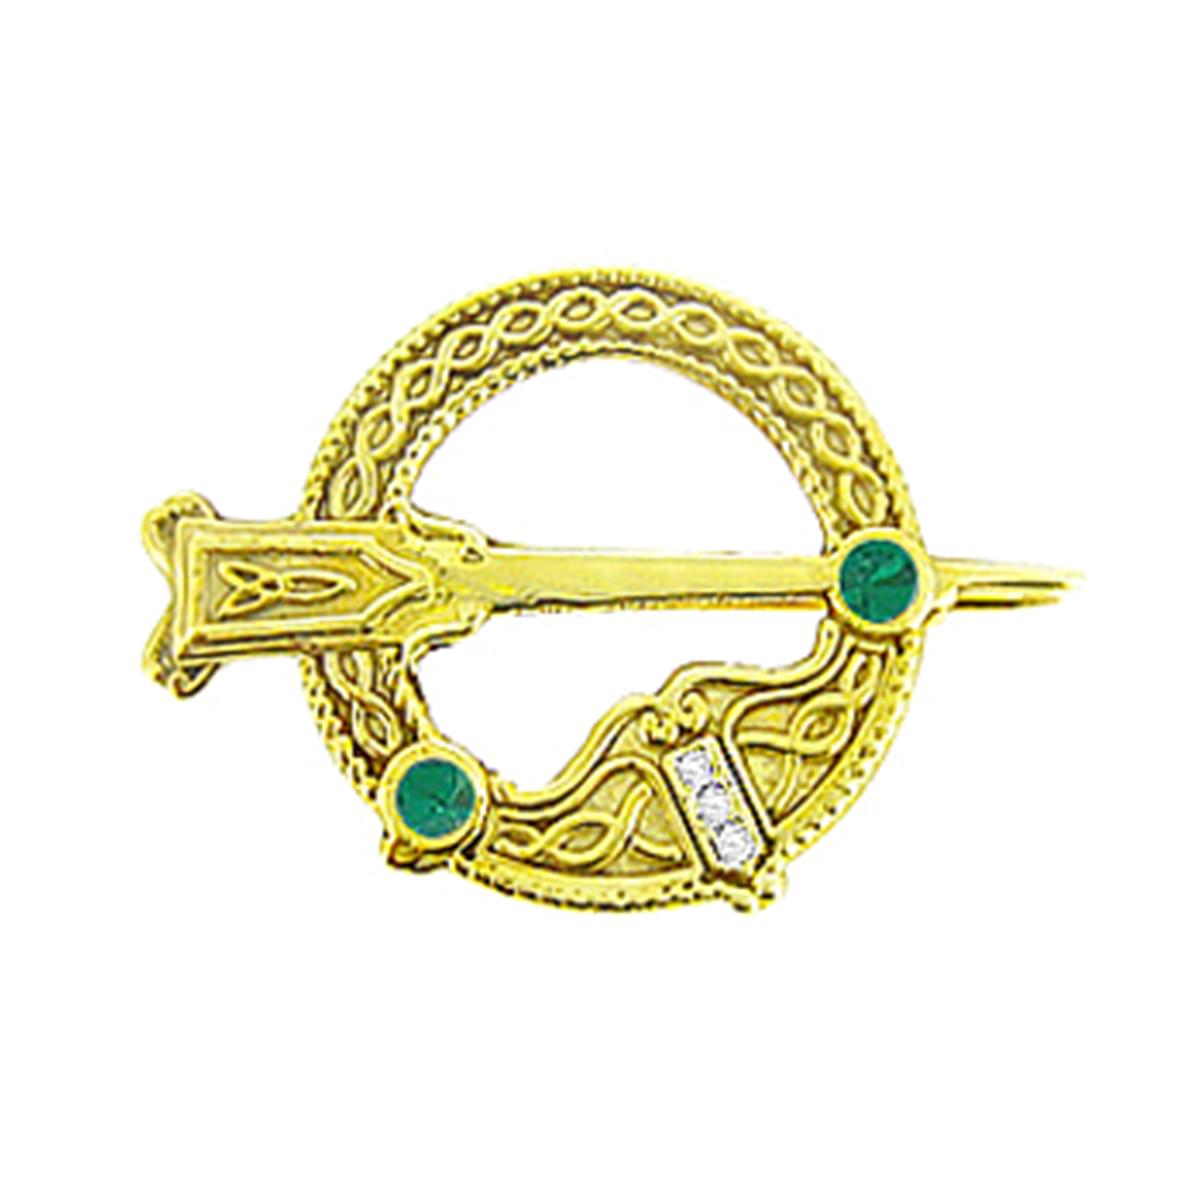 Emerald And Brilliant Cut Diamond Stamped Tara Brooch